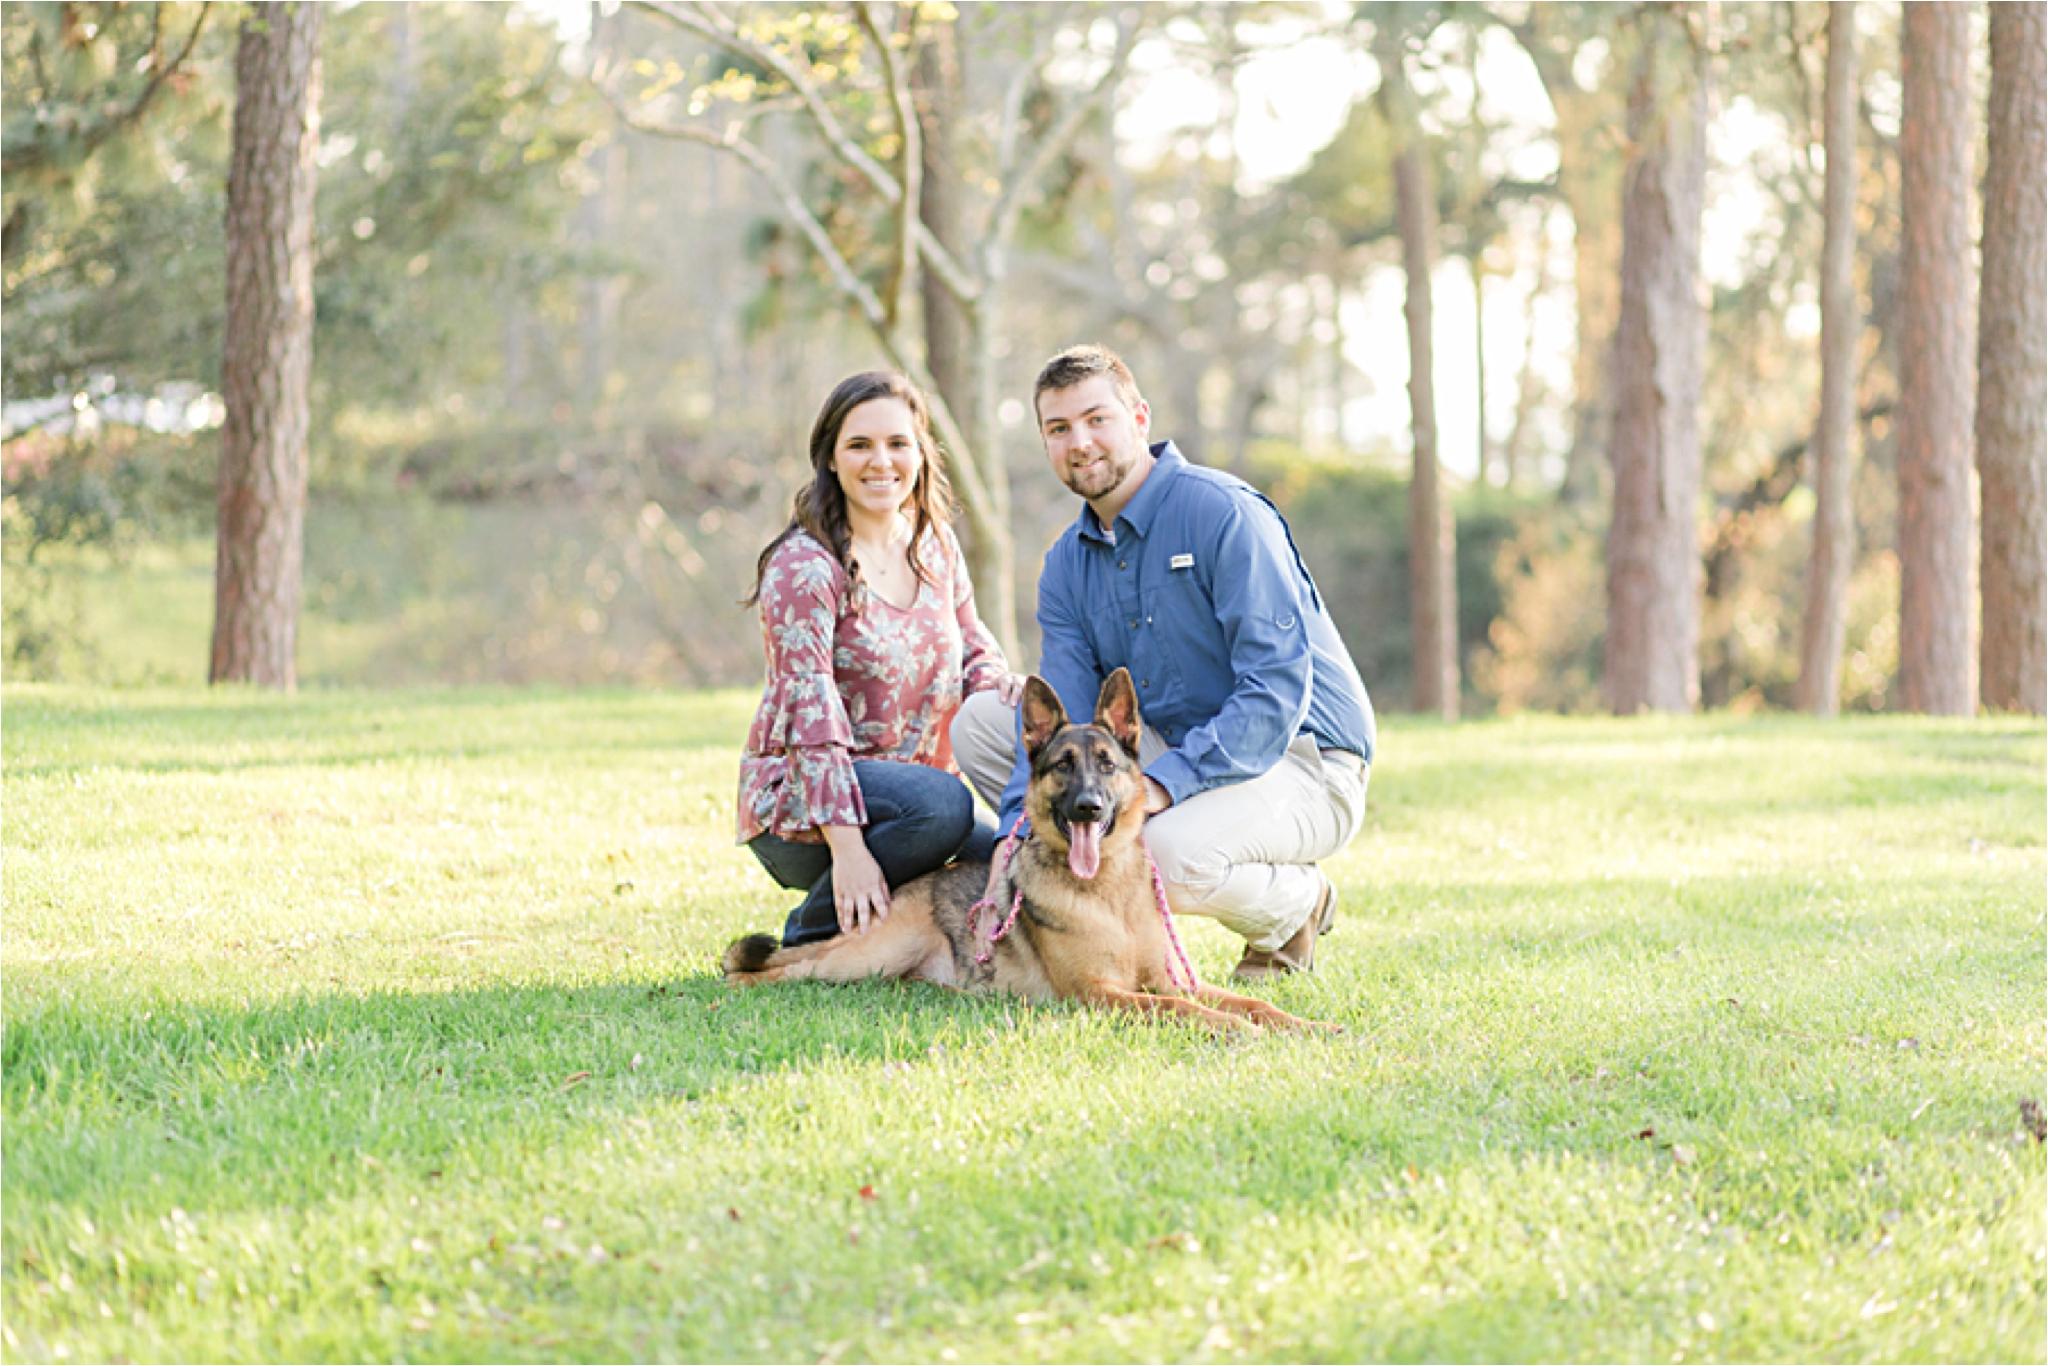 Fairhope Alabama Engagement Session Photographer   Danielle + Taylor